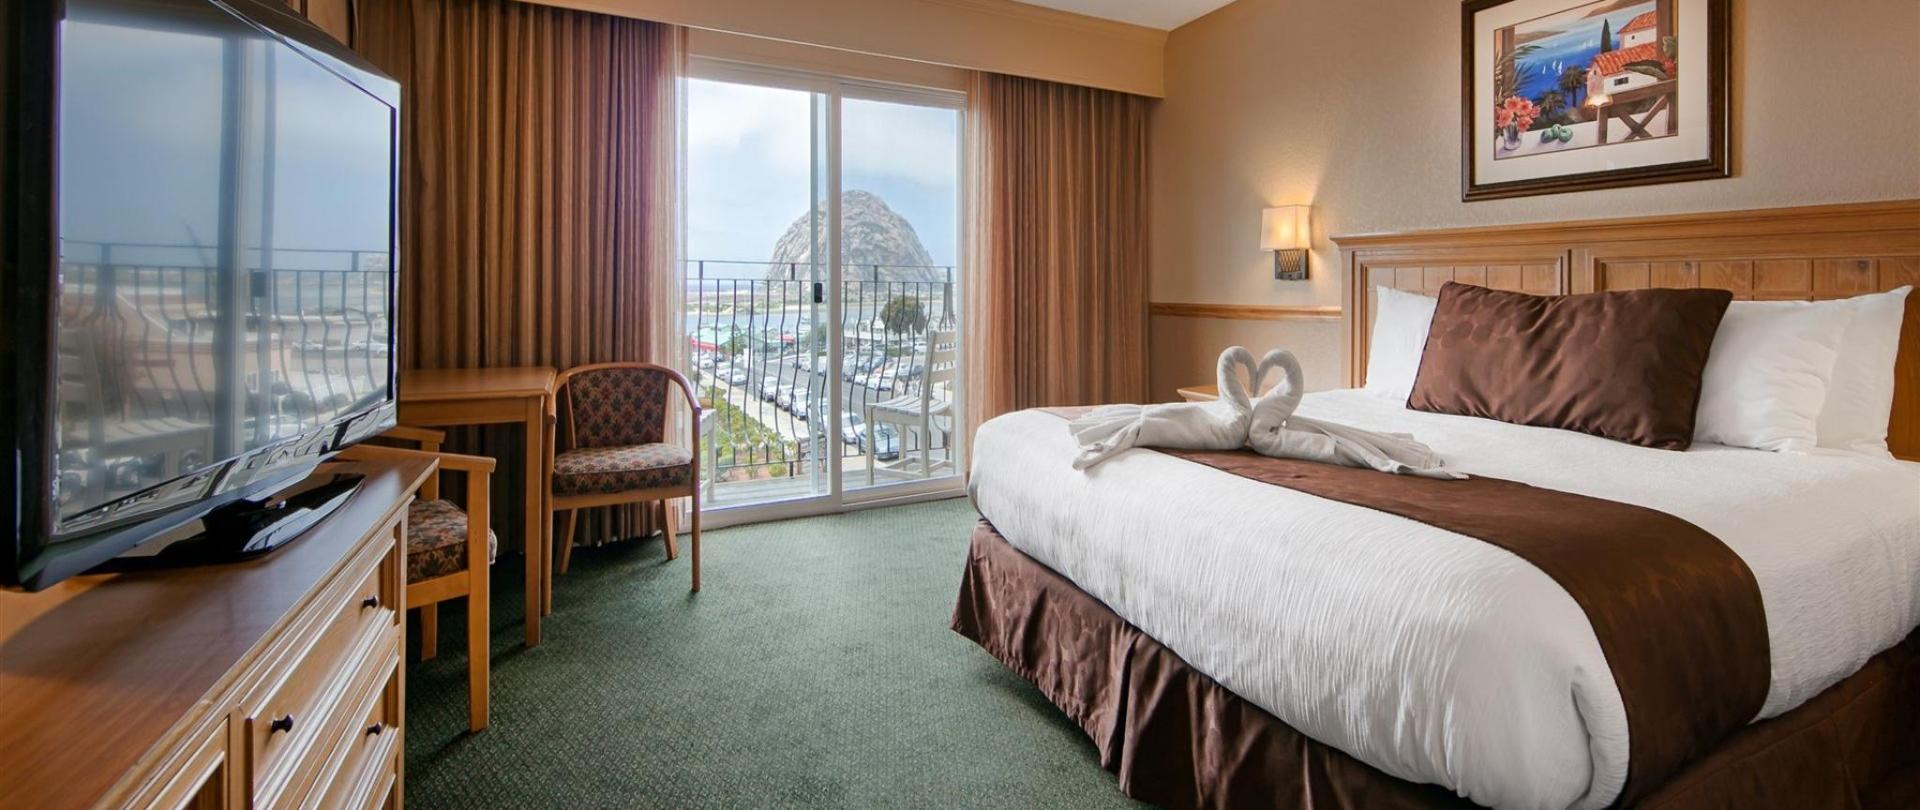 Best Morro Bay Hotels In Travel 2018